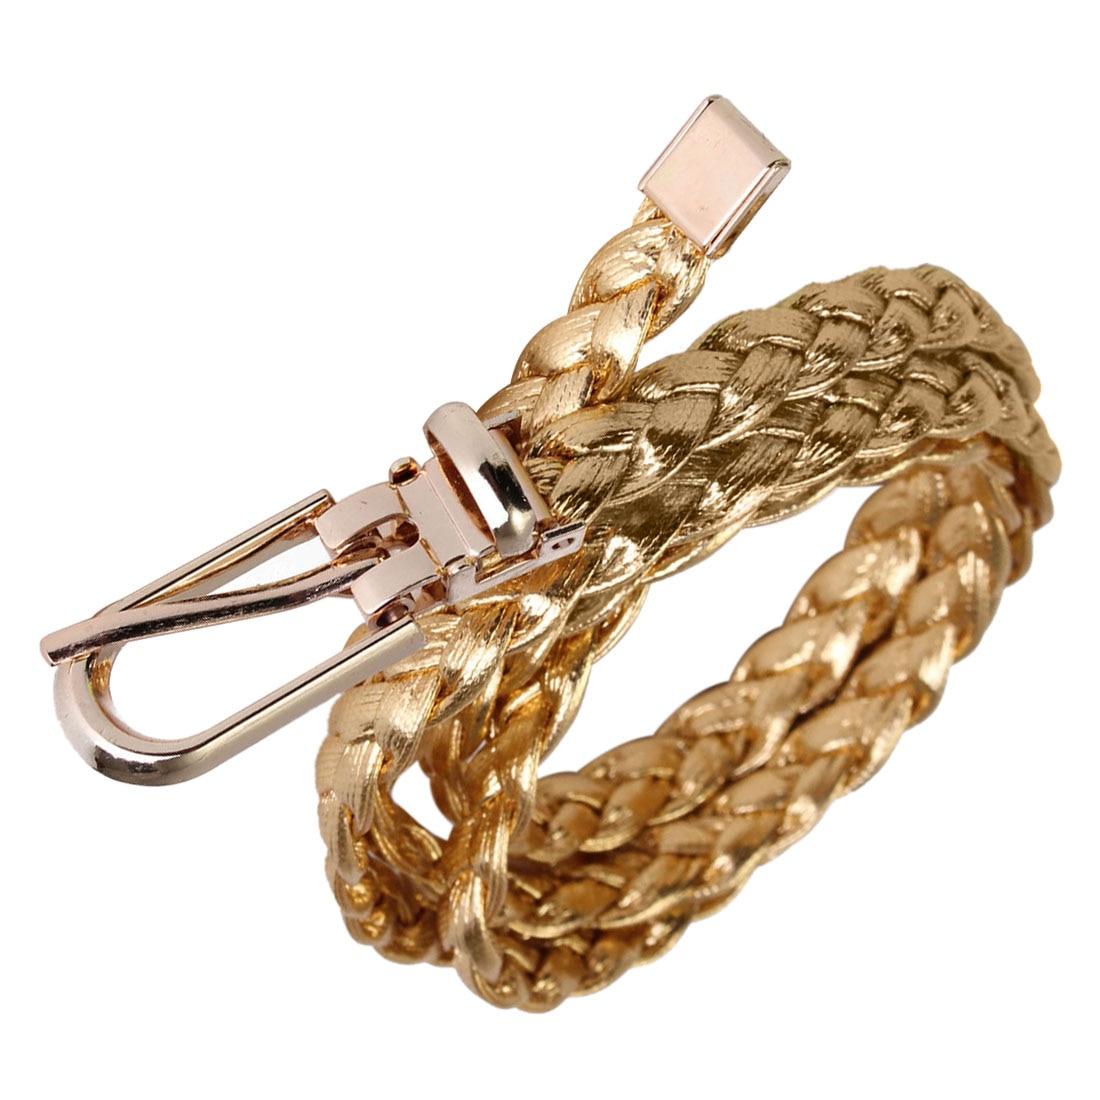 Women Simple Braided PU Leather Narrow Thin Buckle Strap Waist Belt Waistband Colors: Gold